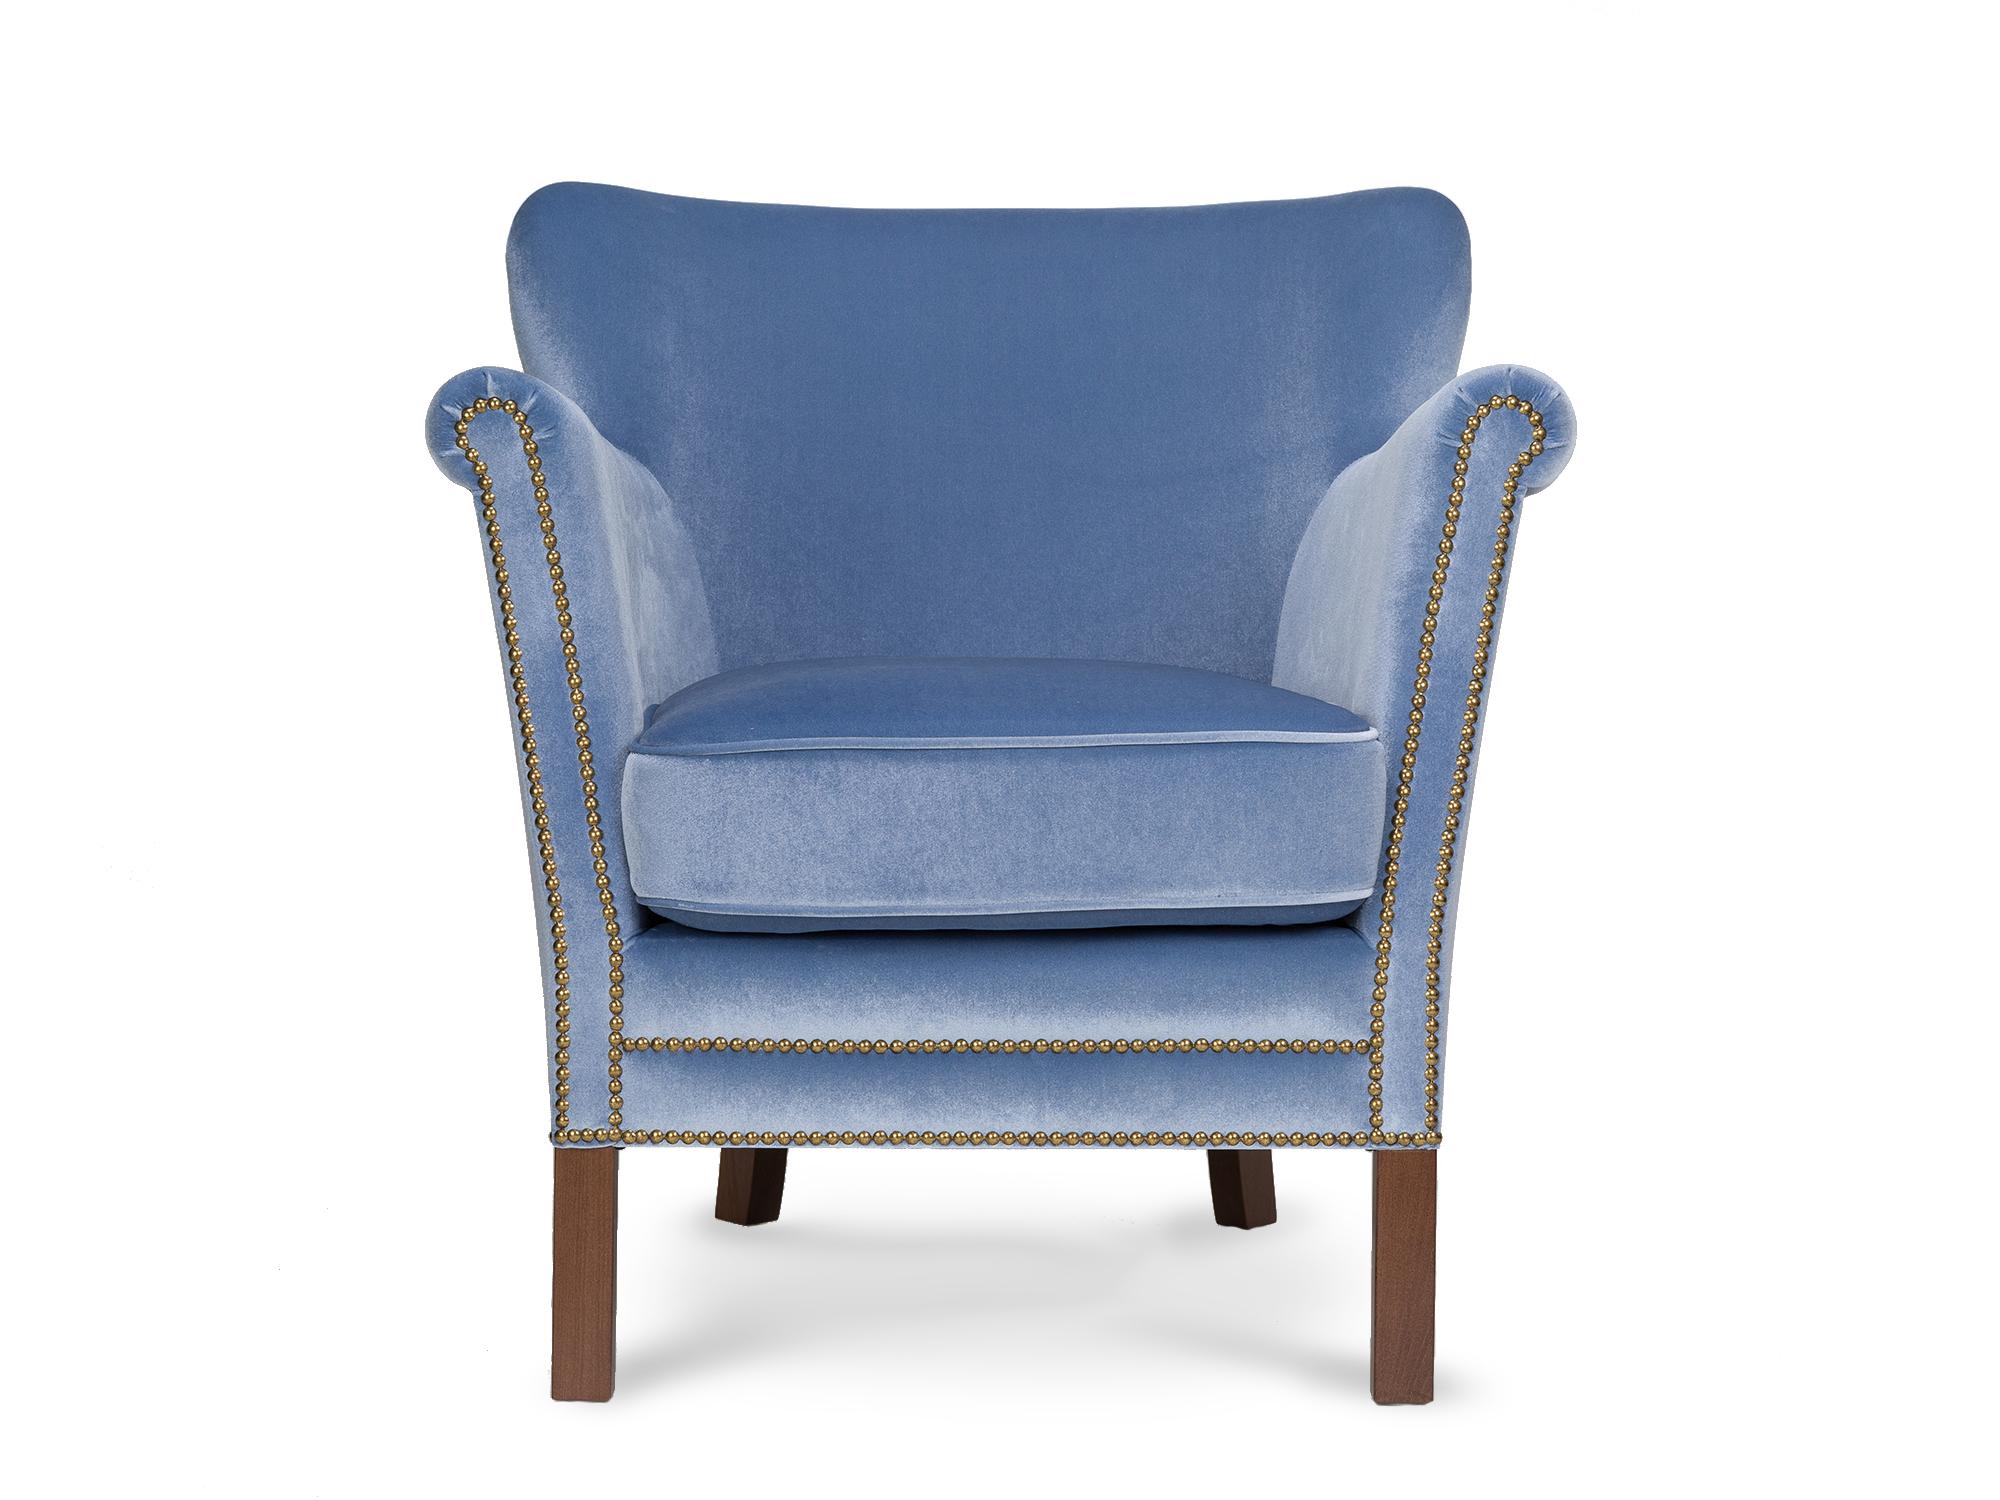 Кресло MyFurnish 15432532 от thefurnish